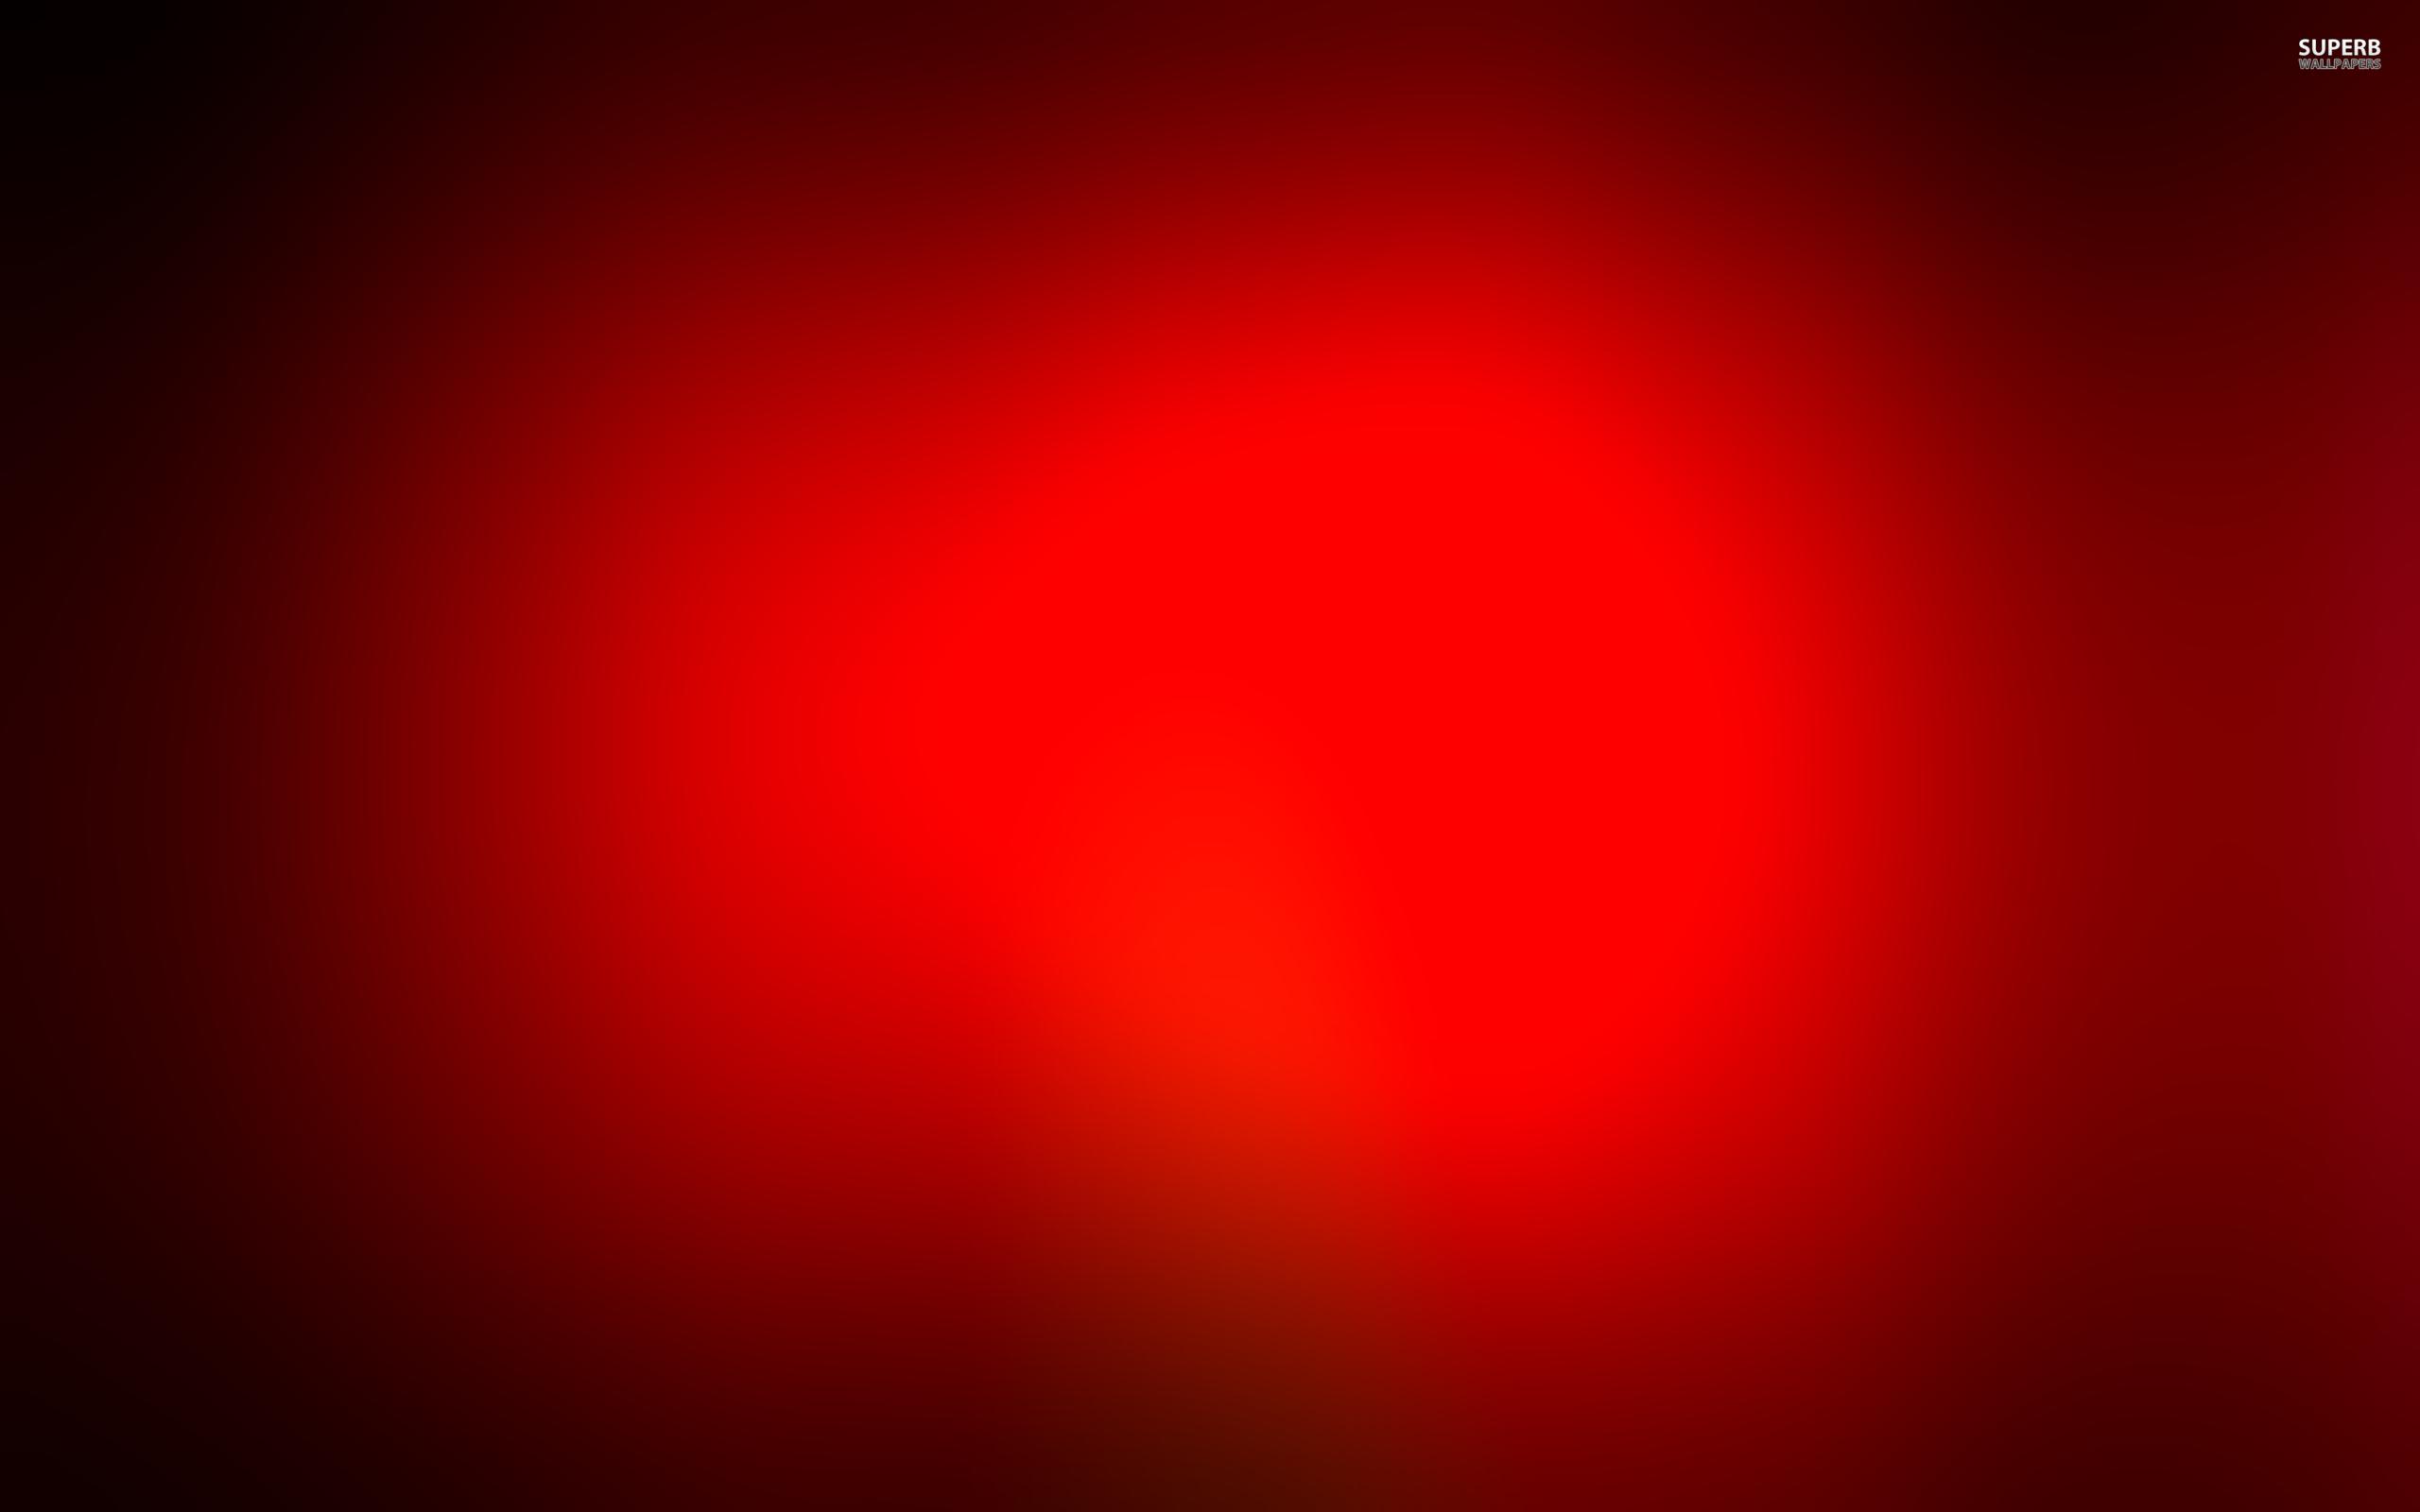 Red Wallpaper 19 - WallpaperCanyon Home